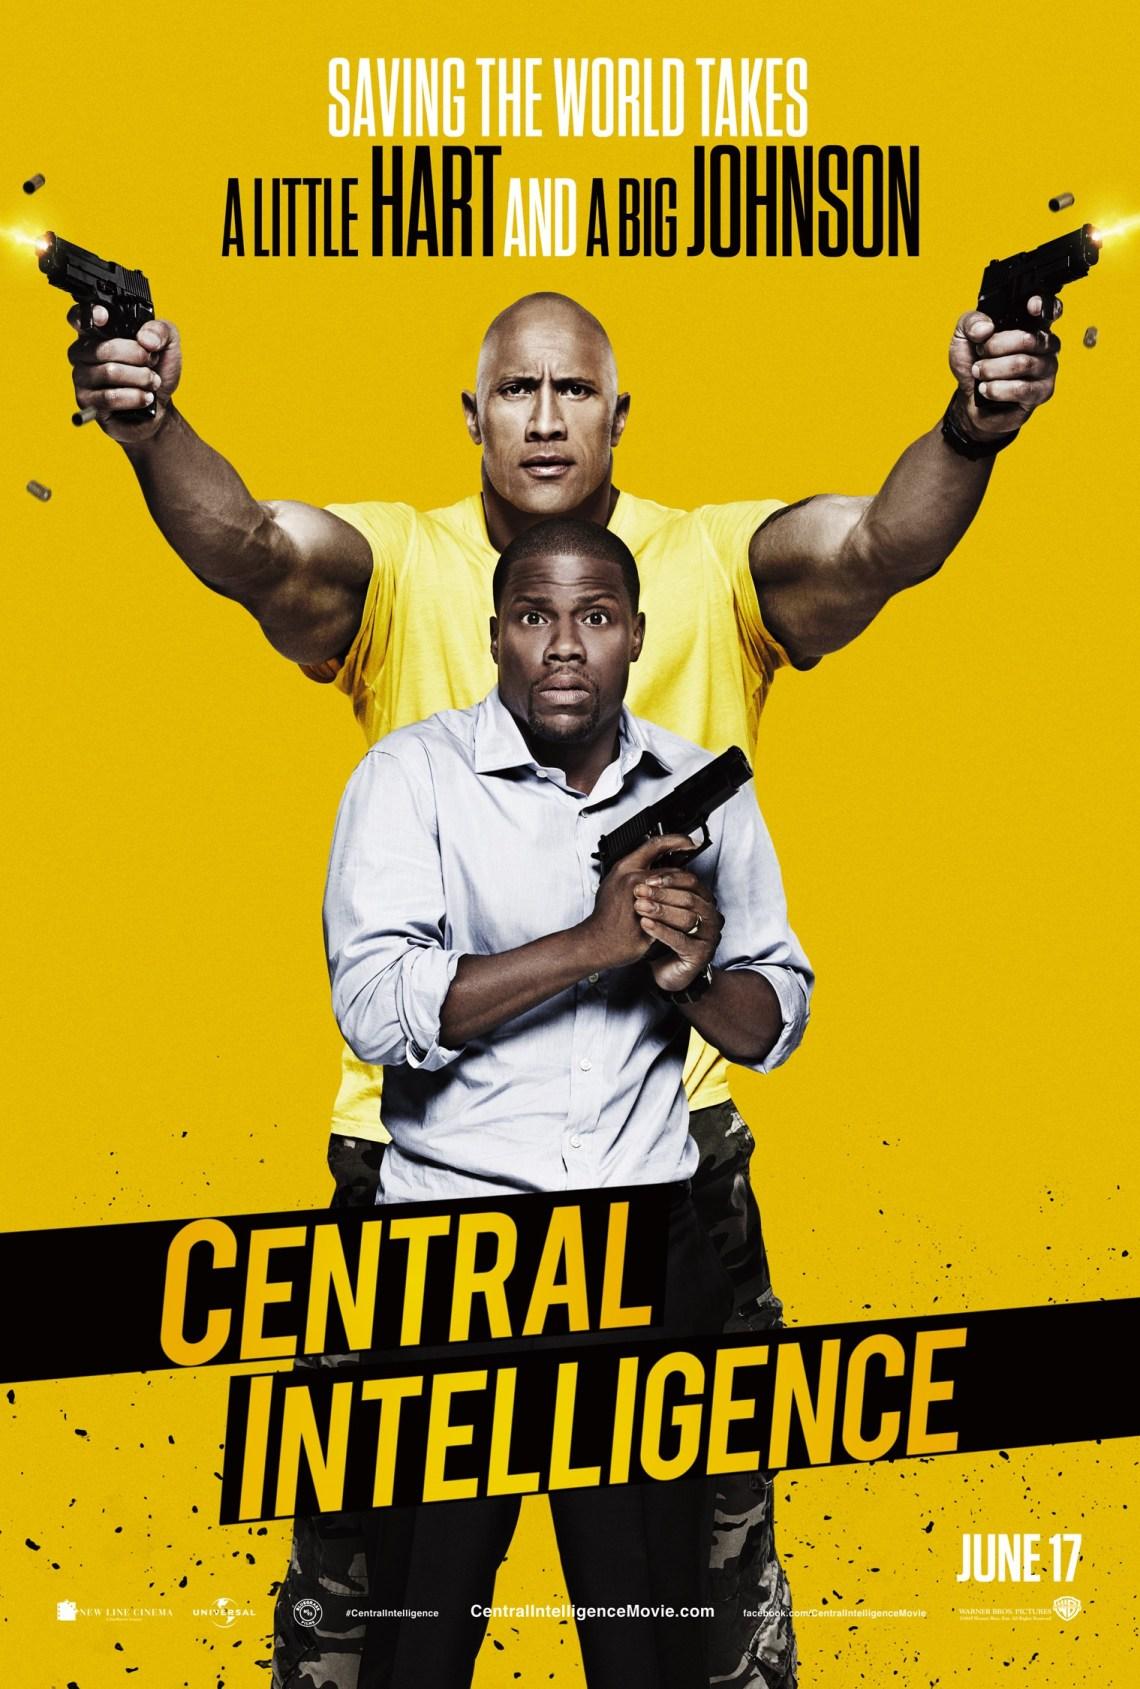 Central Intelligence Poster via impawards.com